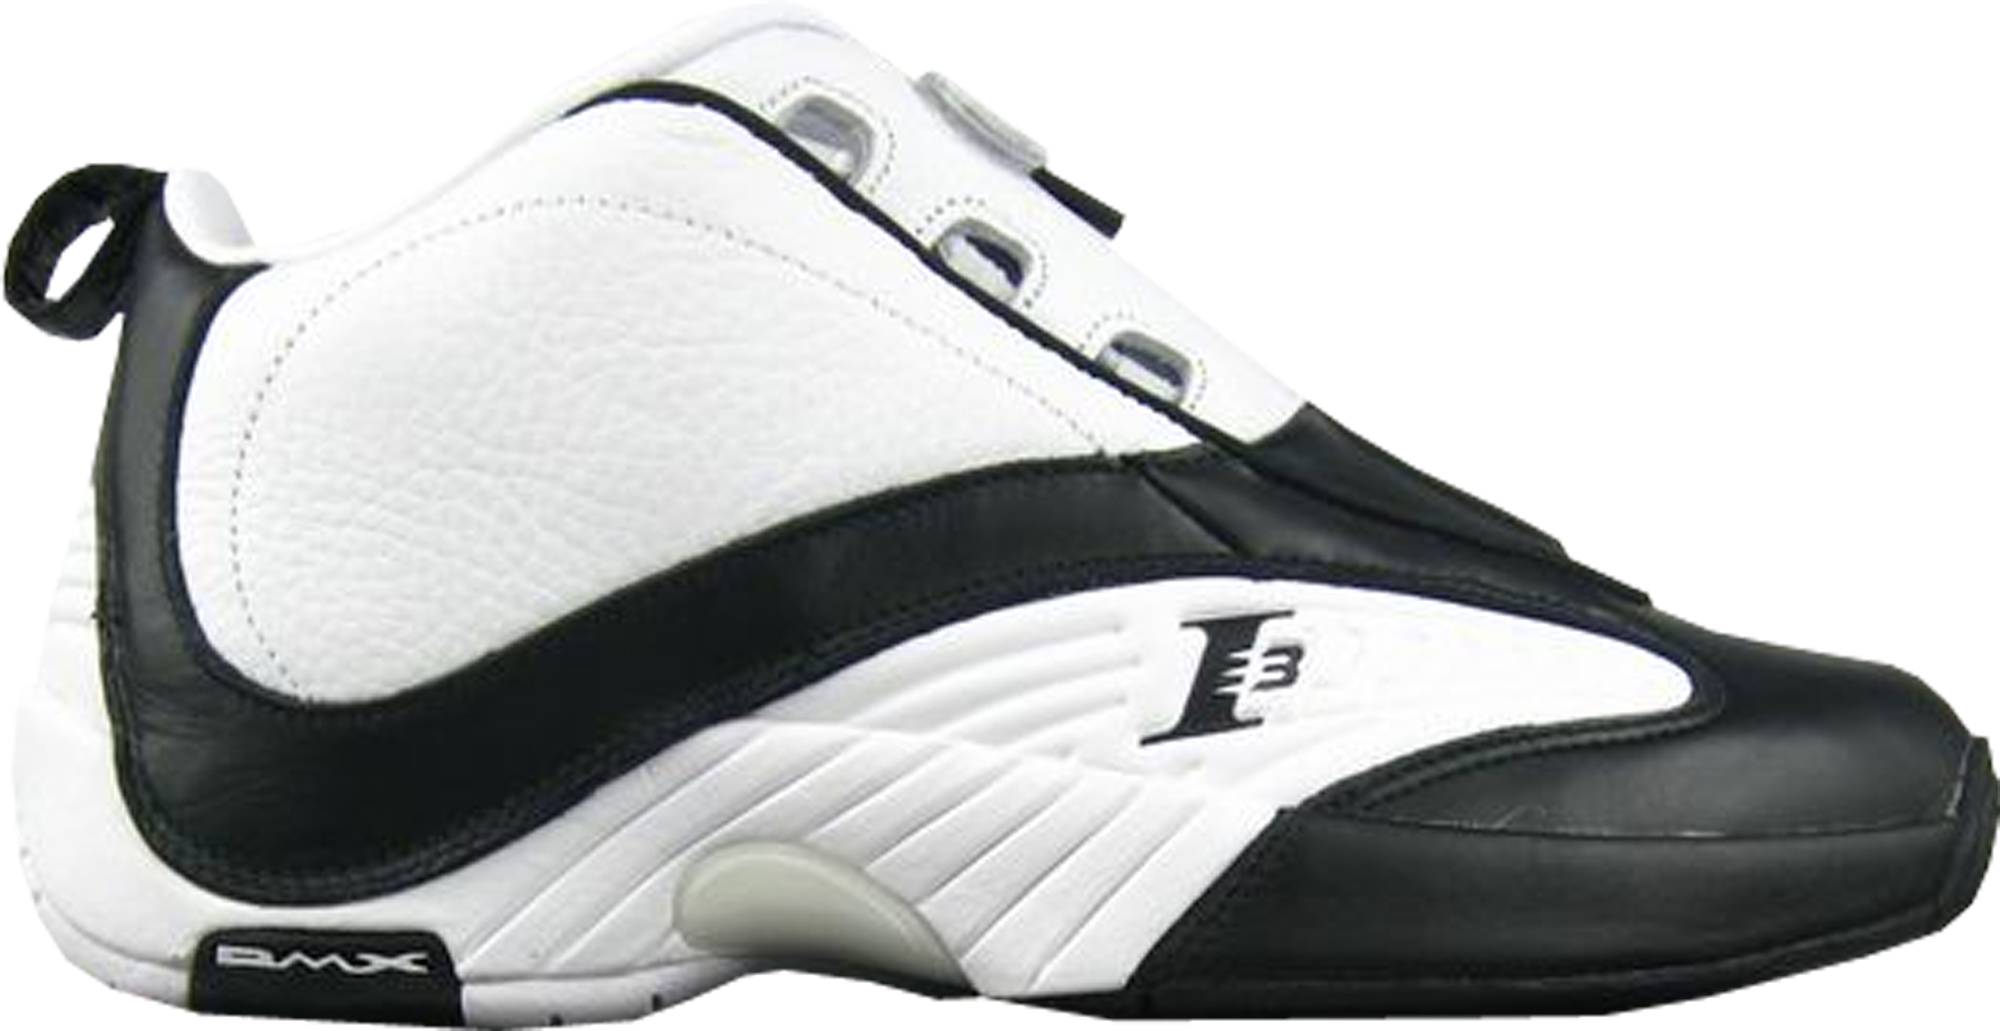 Allen Iverson Shoes: The Complete